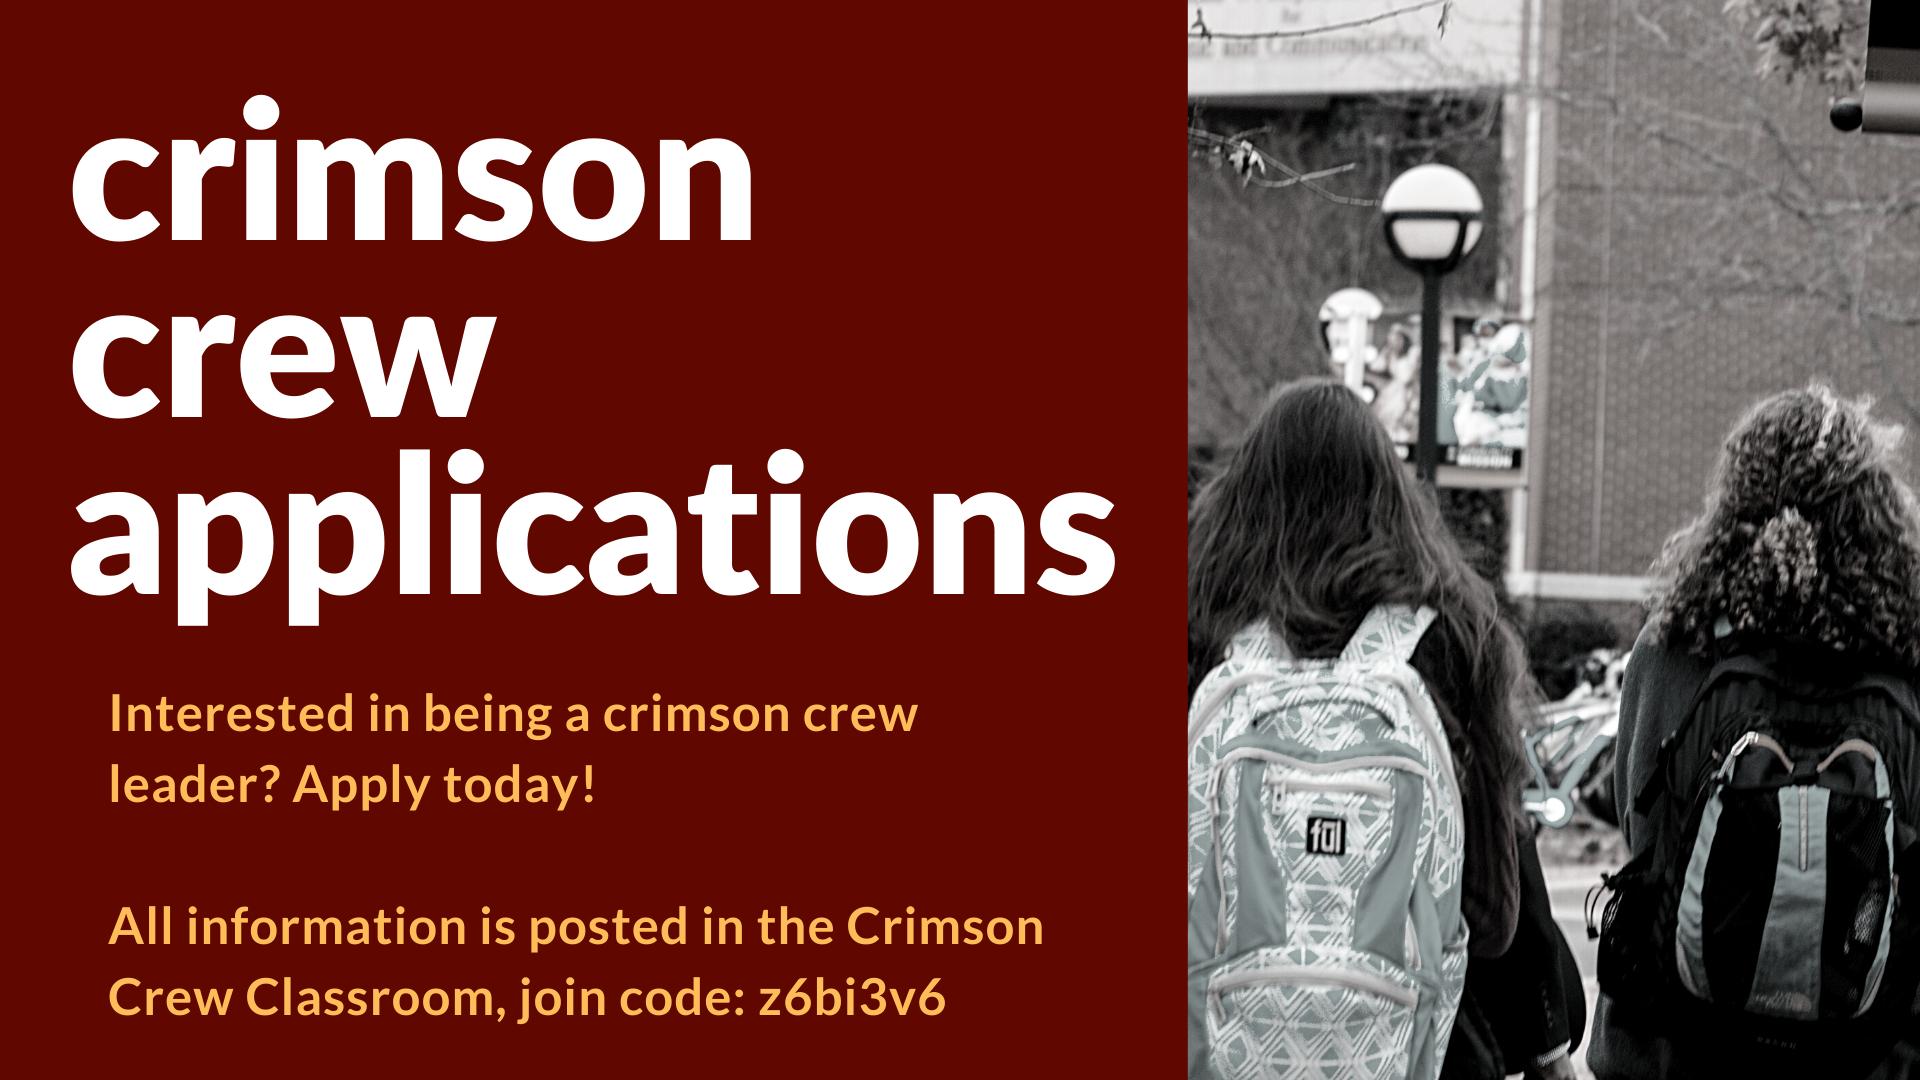 crimson crew applications